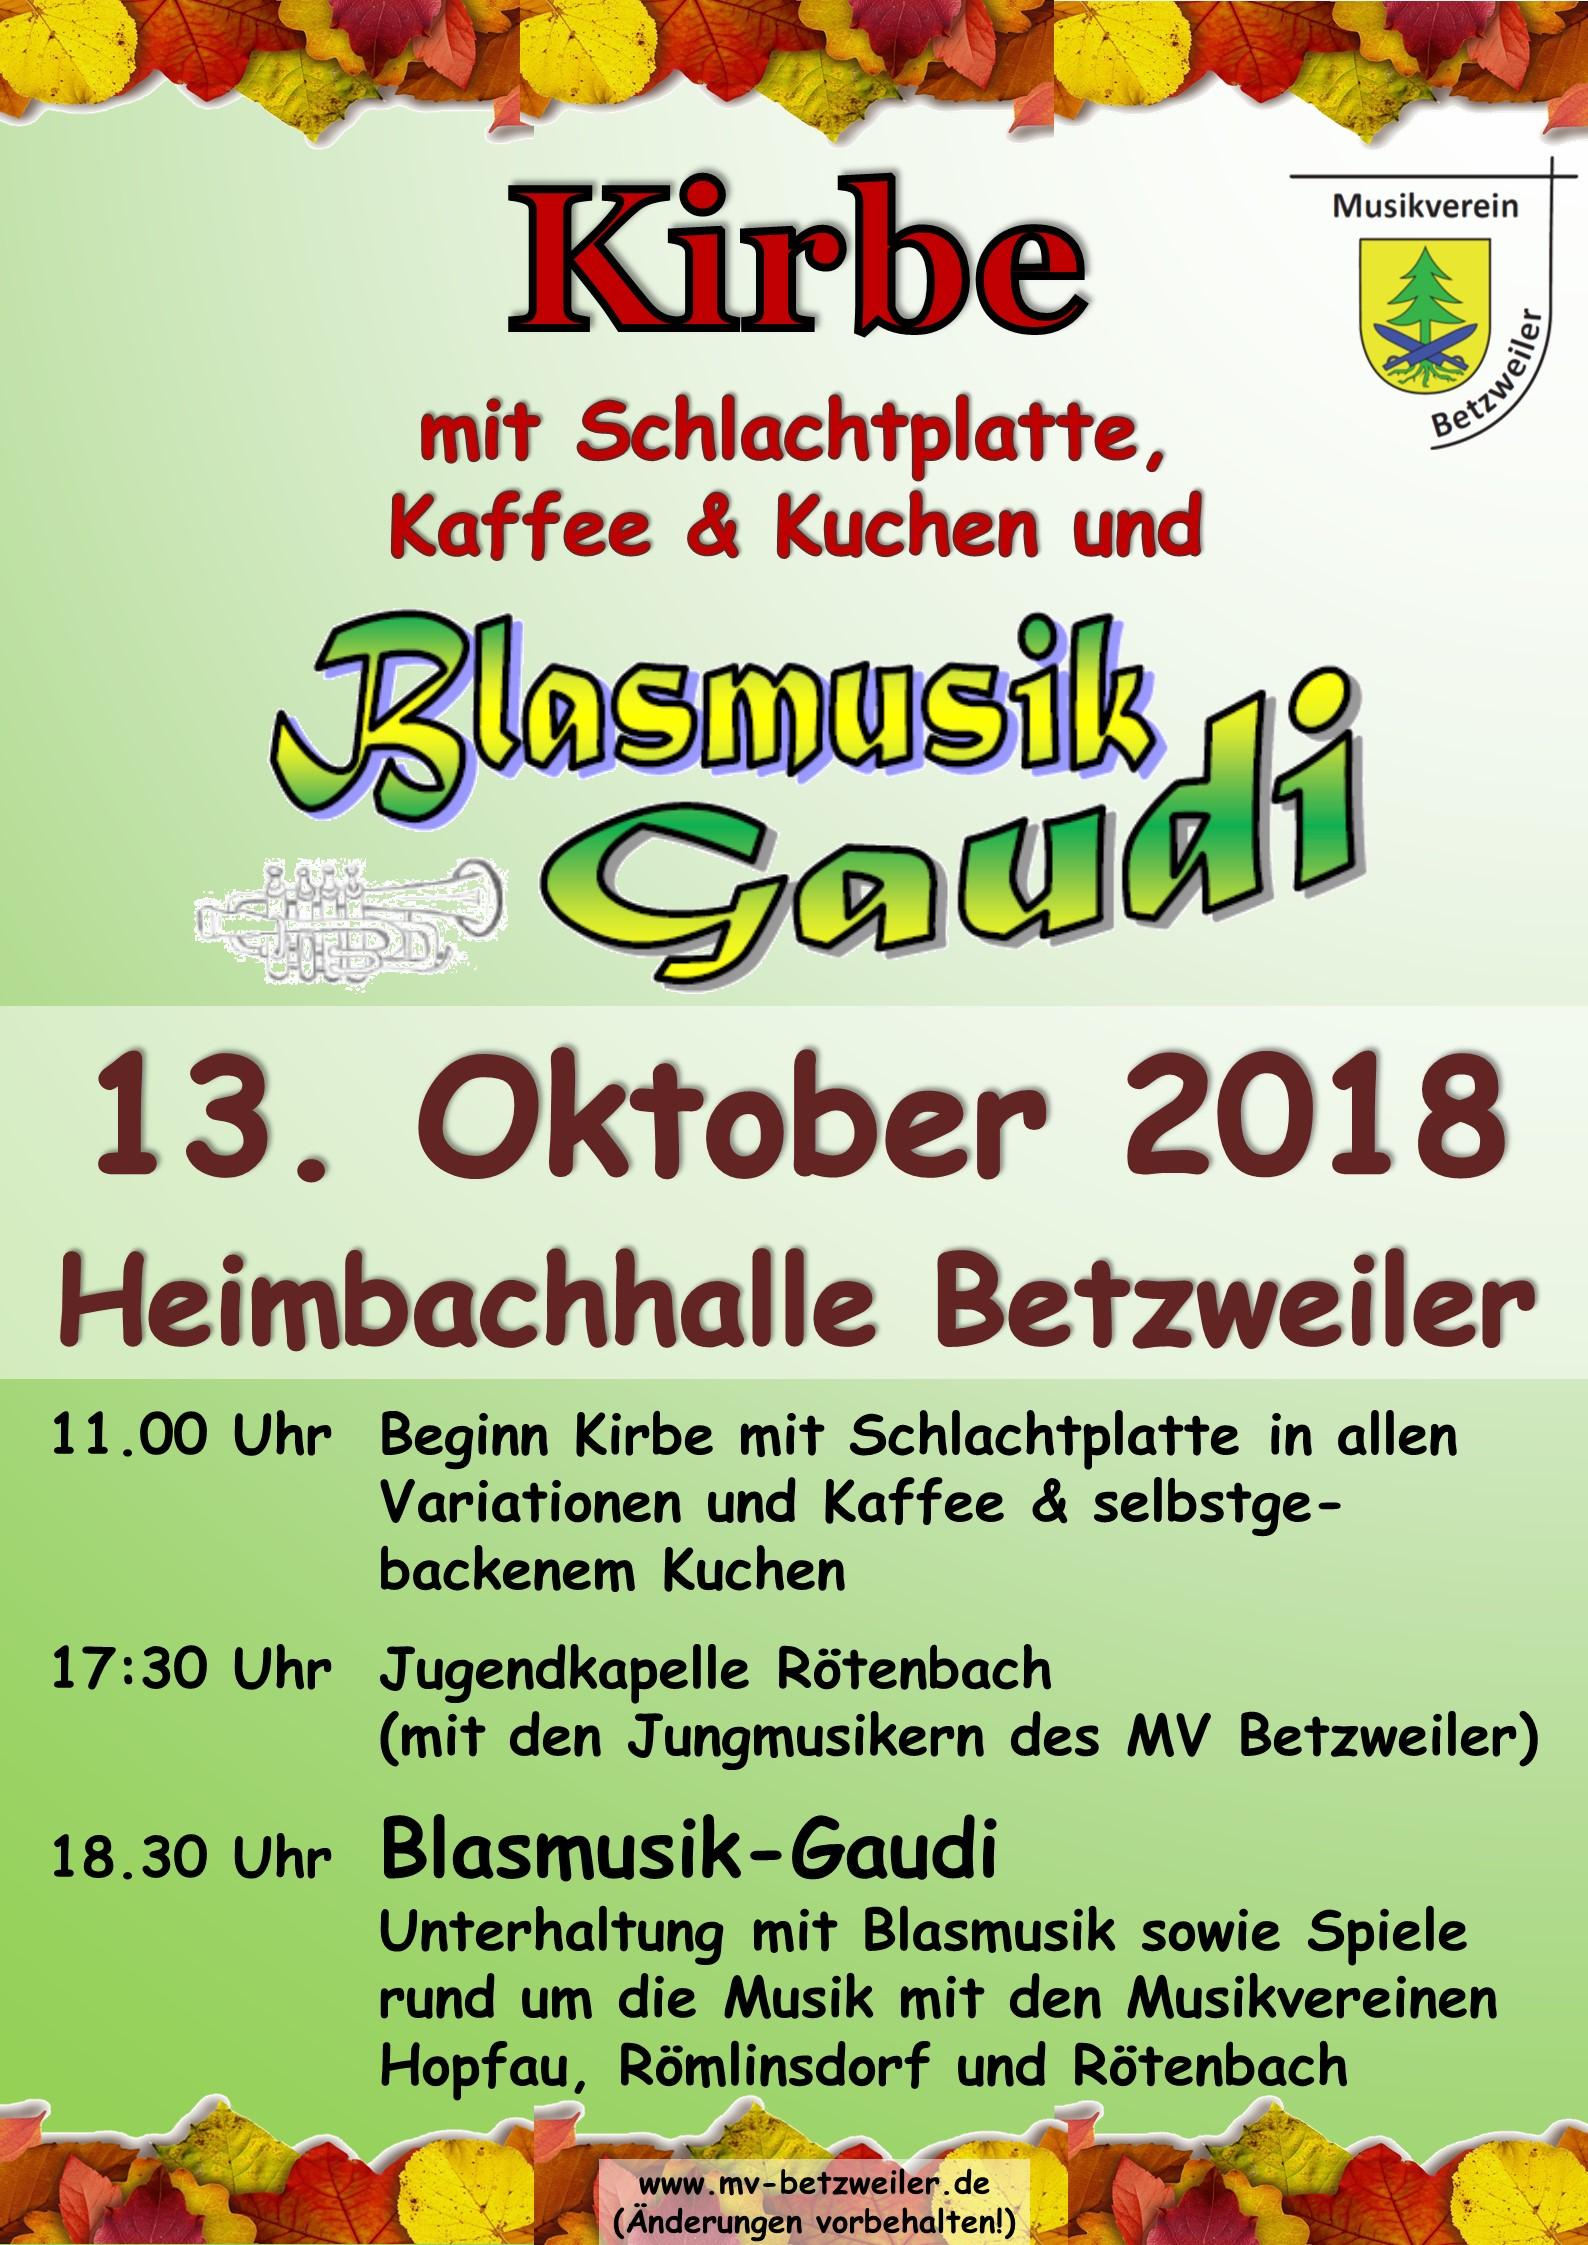 Einladung Kirbe Blasmusikgaudi 2018